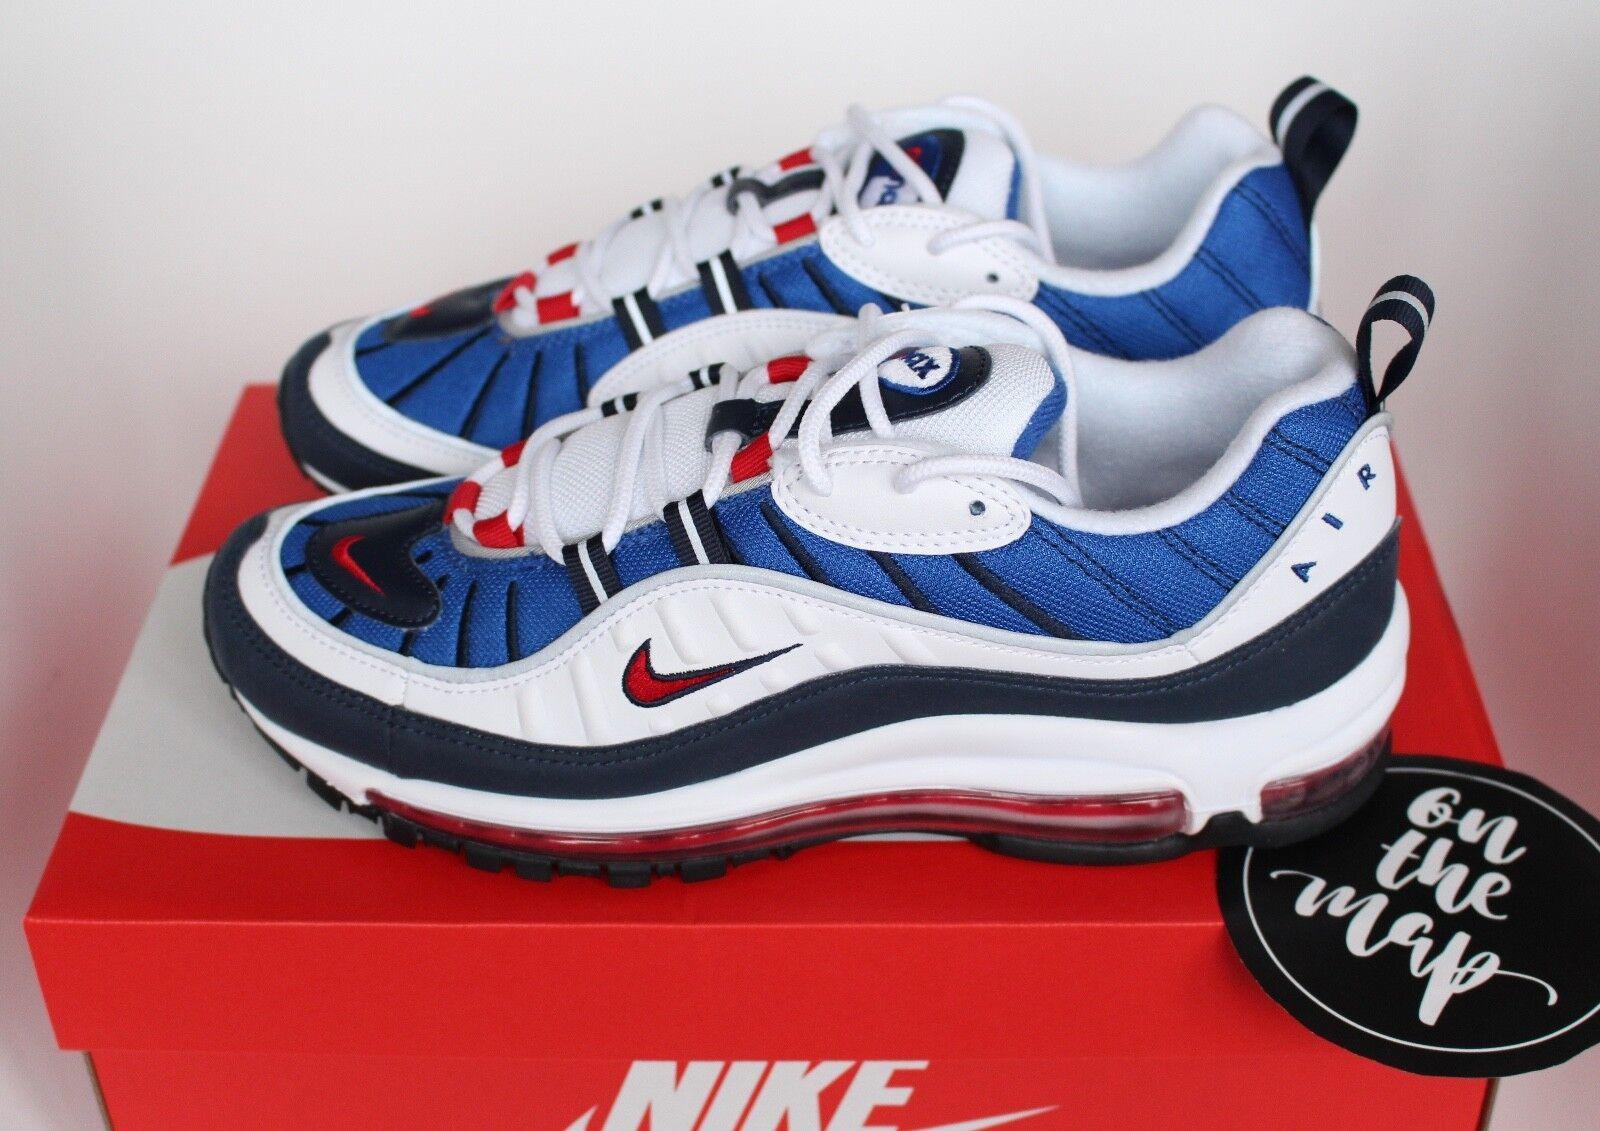 Nike Air Max 98 Gundam QS og azul blanco Wild rojo 640744-100 US New Wild blanco Casual Shoes 6521f4